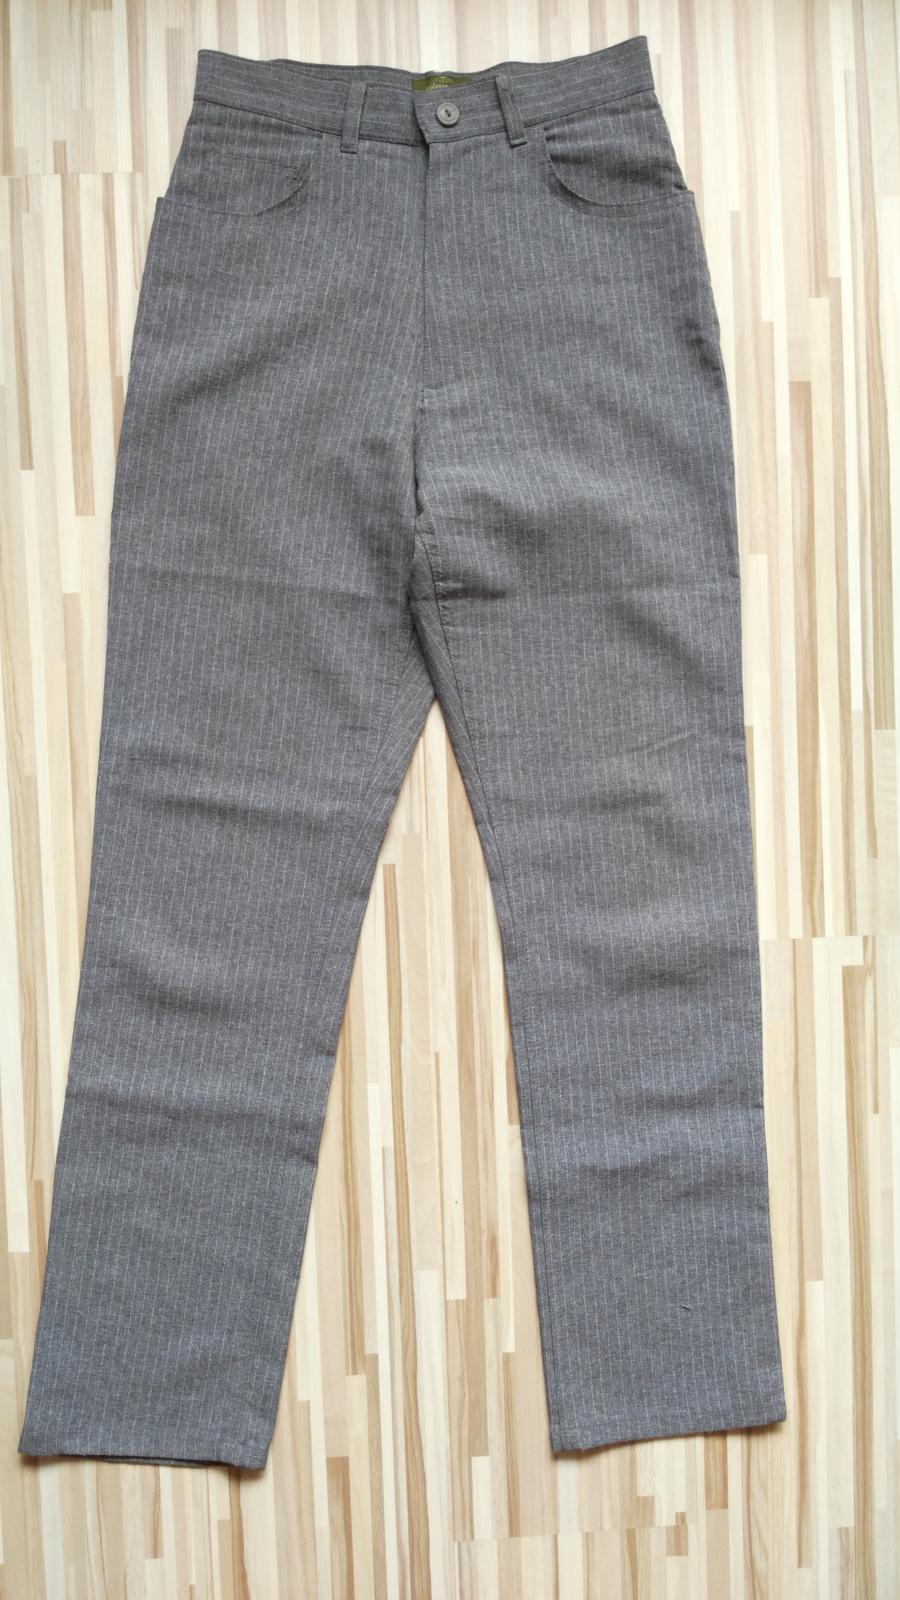 d7ef38a6da2c Šedé elegantné nohavice s pásikmi 36 s